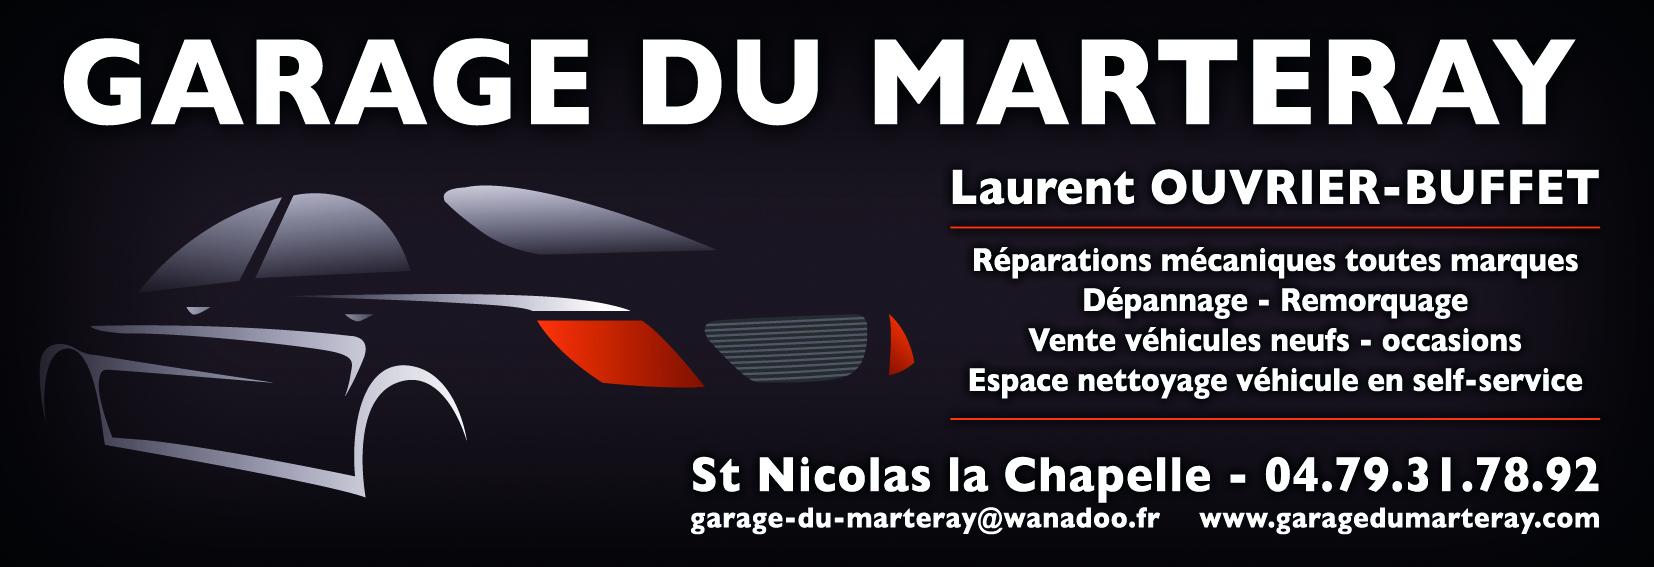 garage marteray.jpg